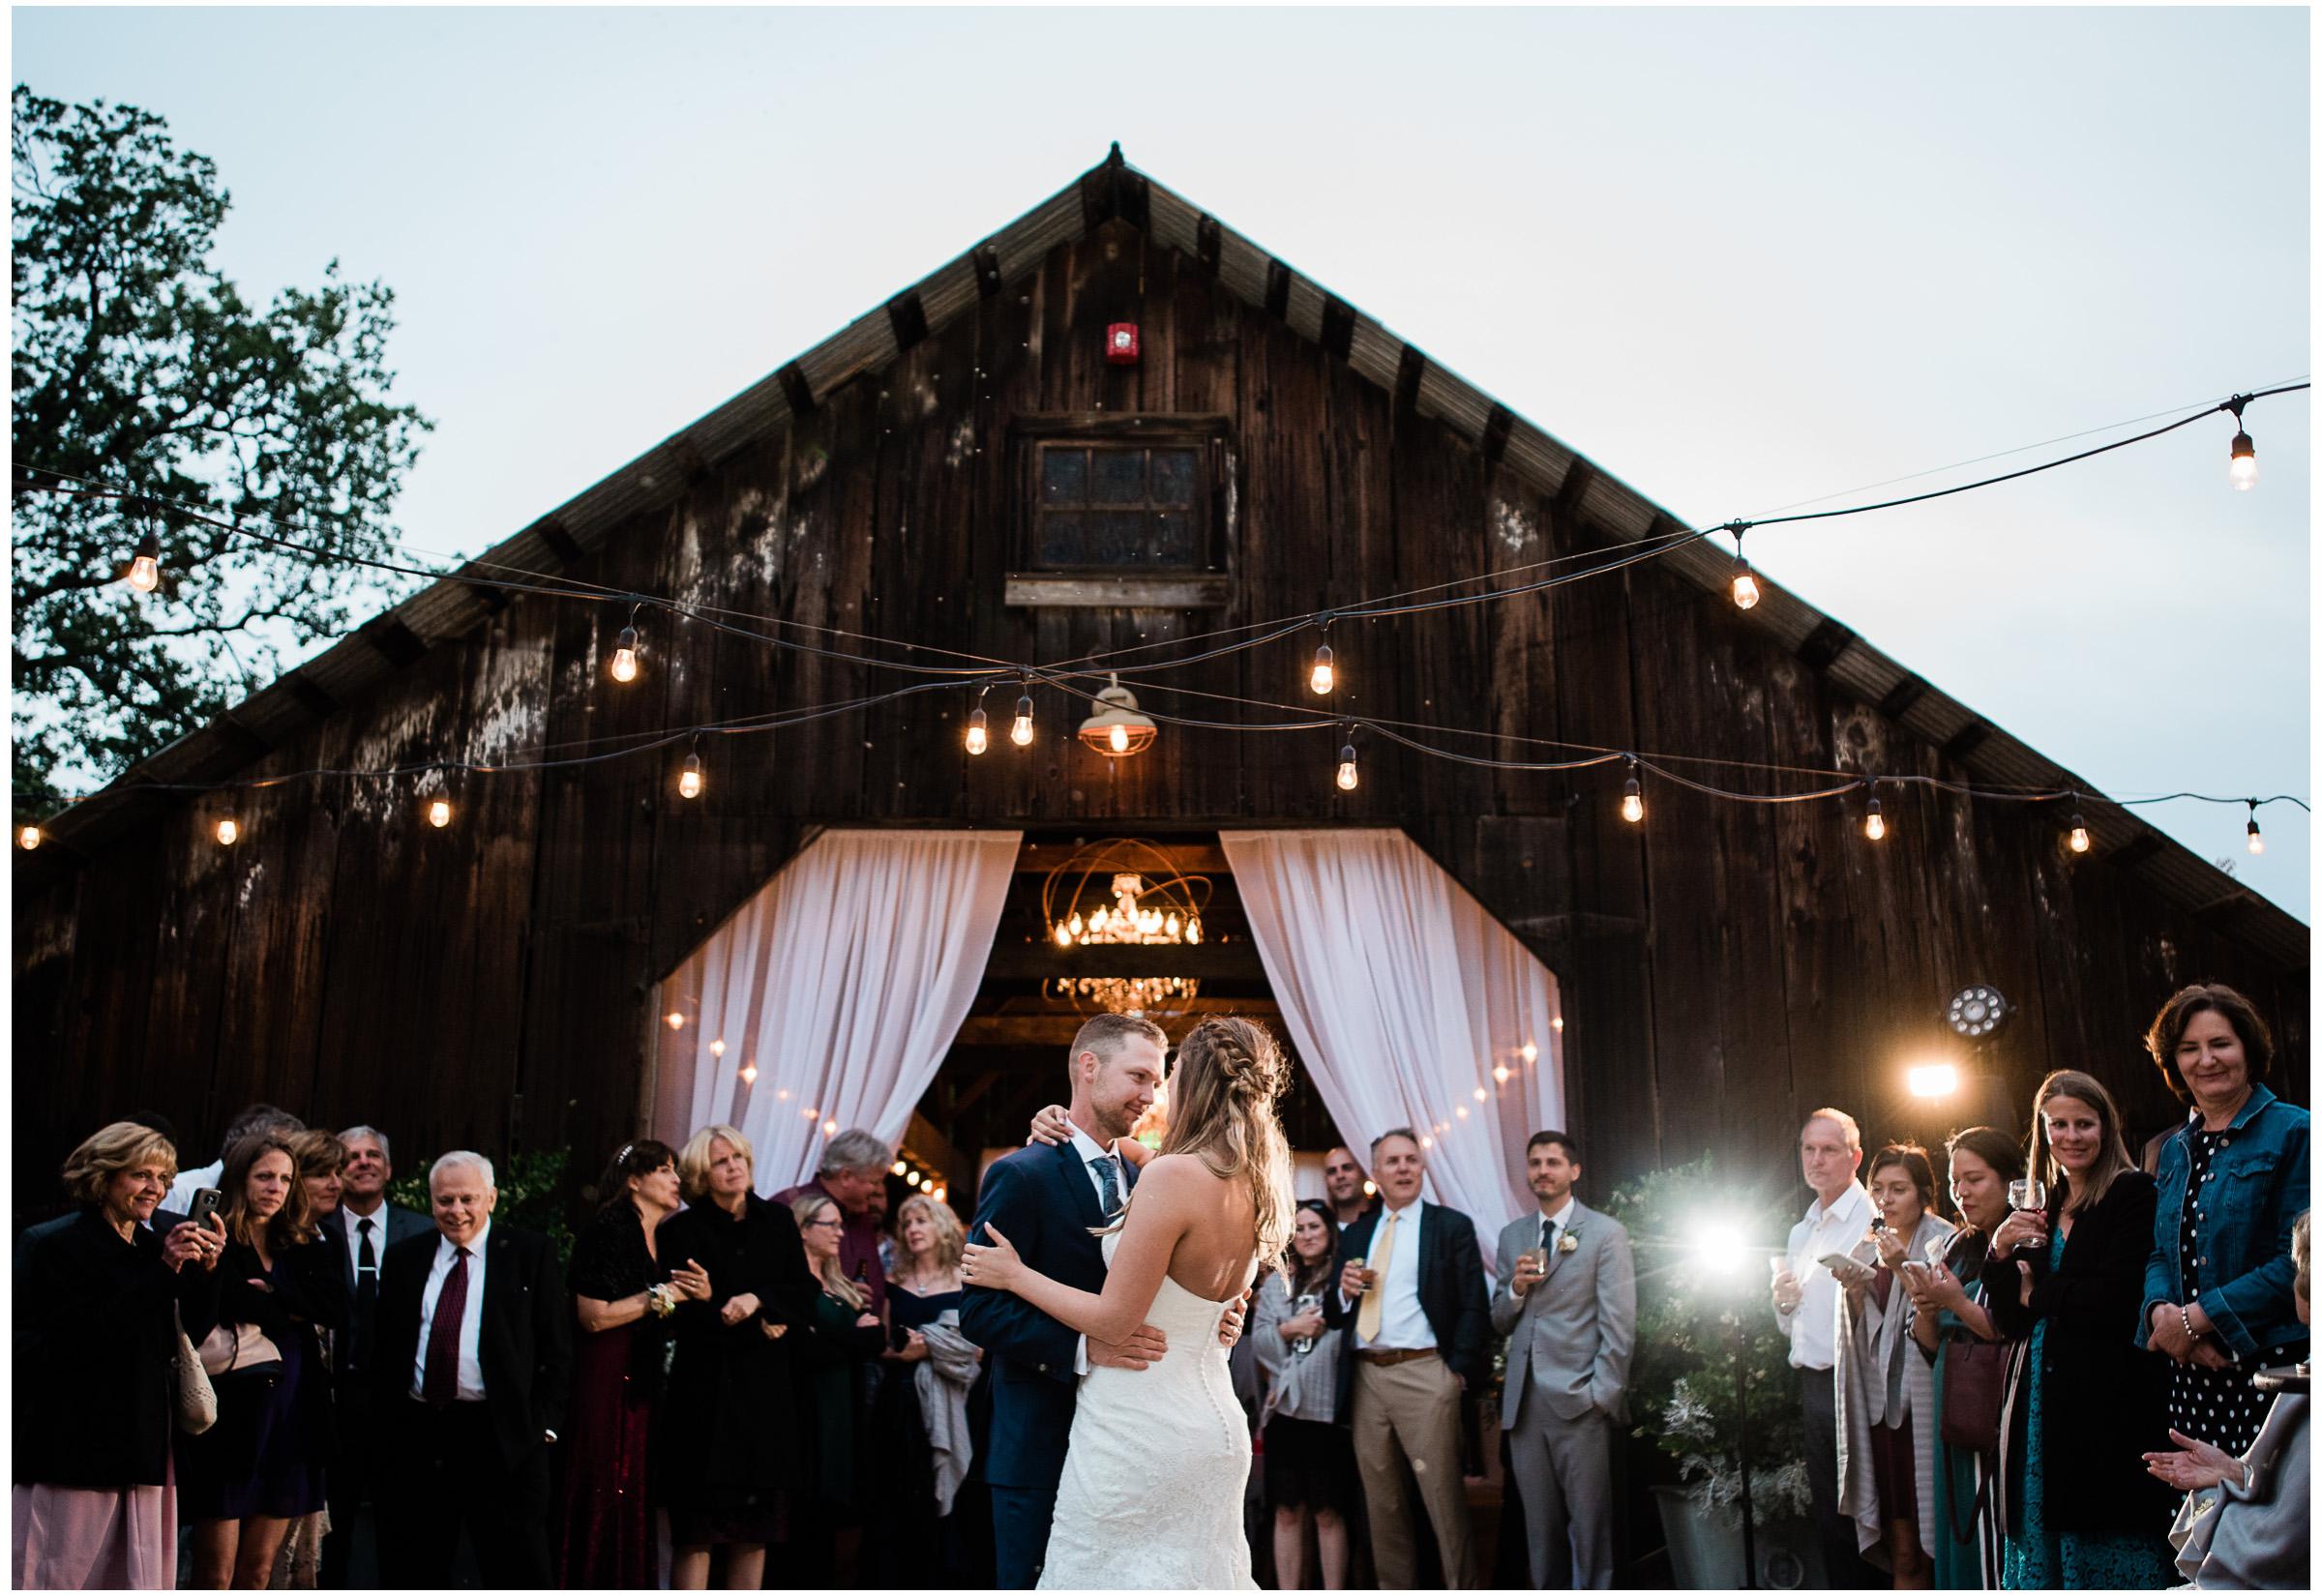 Winters Wedding - Sacramento Photographer - Field & Pond - Justin Wilcox Photography - 34.jpg